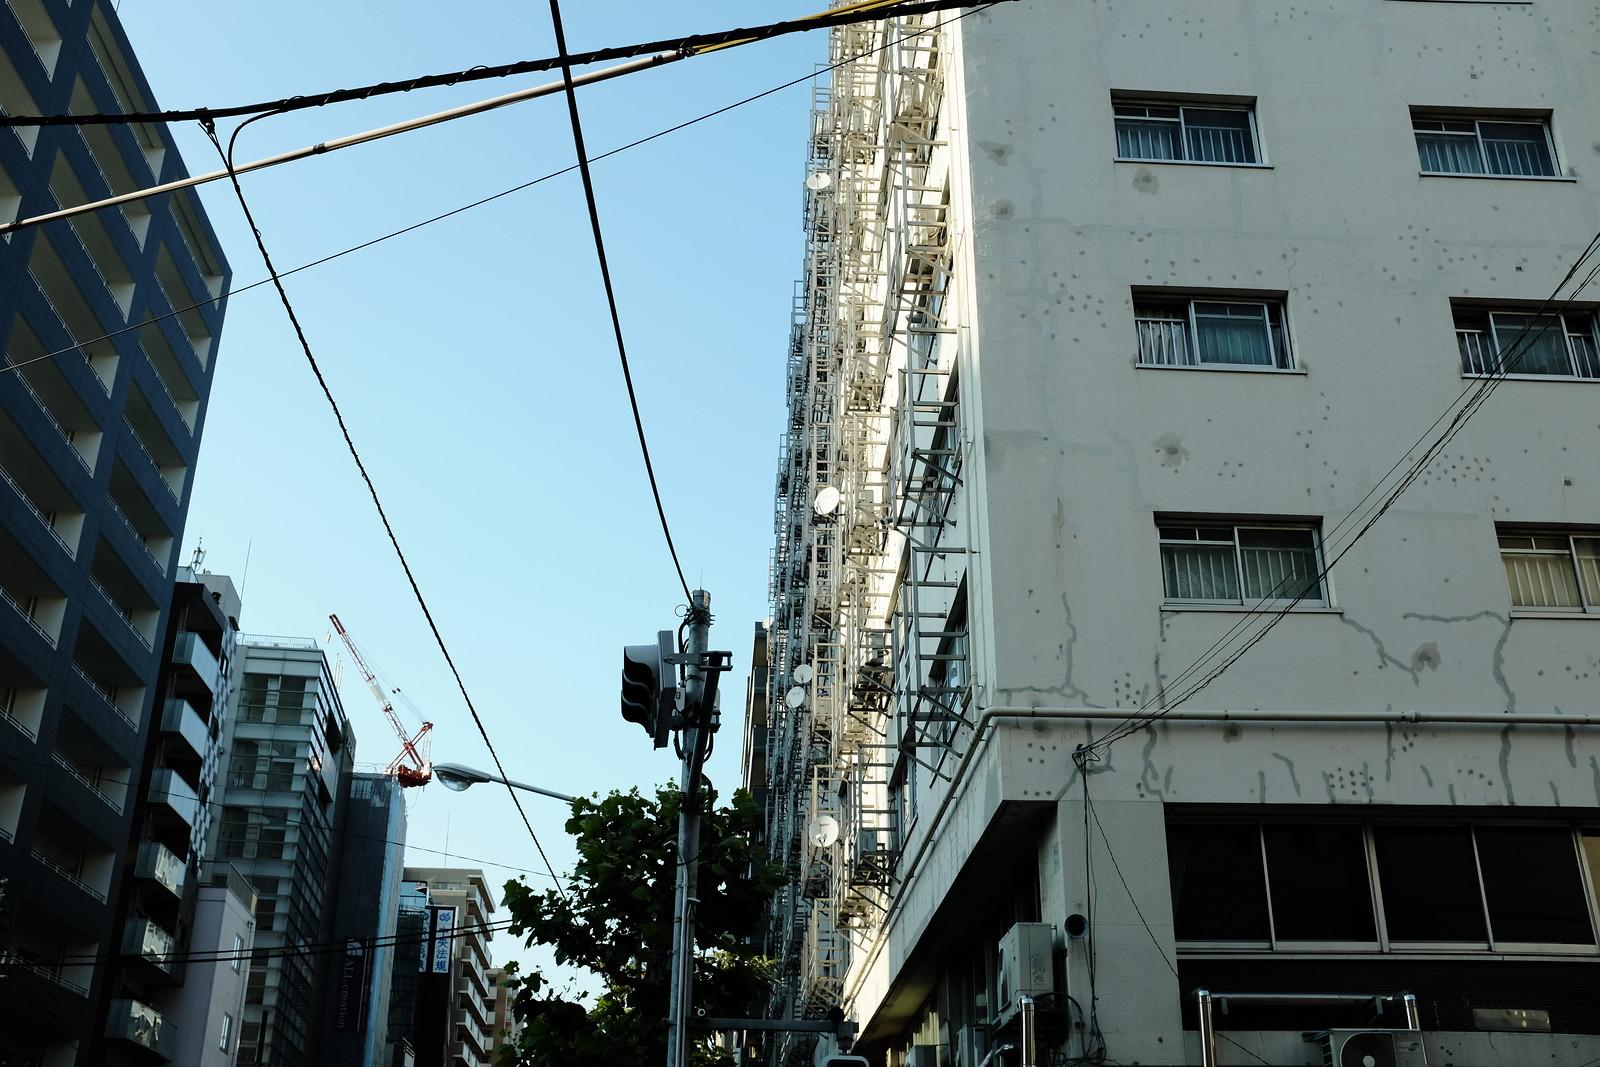 The Taito-ku Tokyo photo by FUJIFILM X100S.